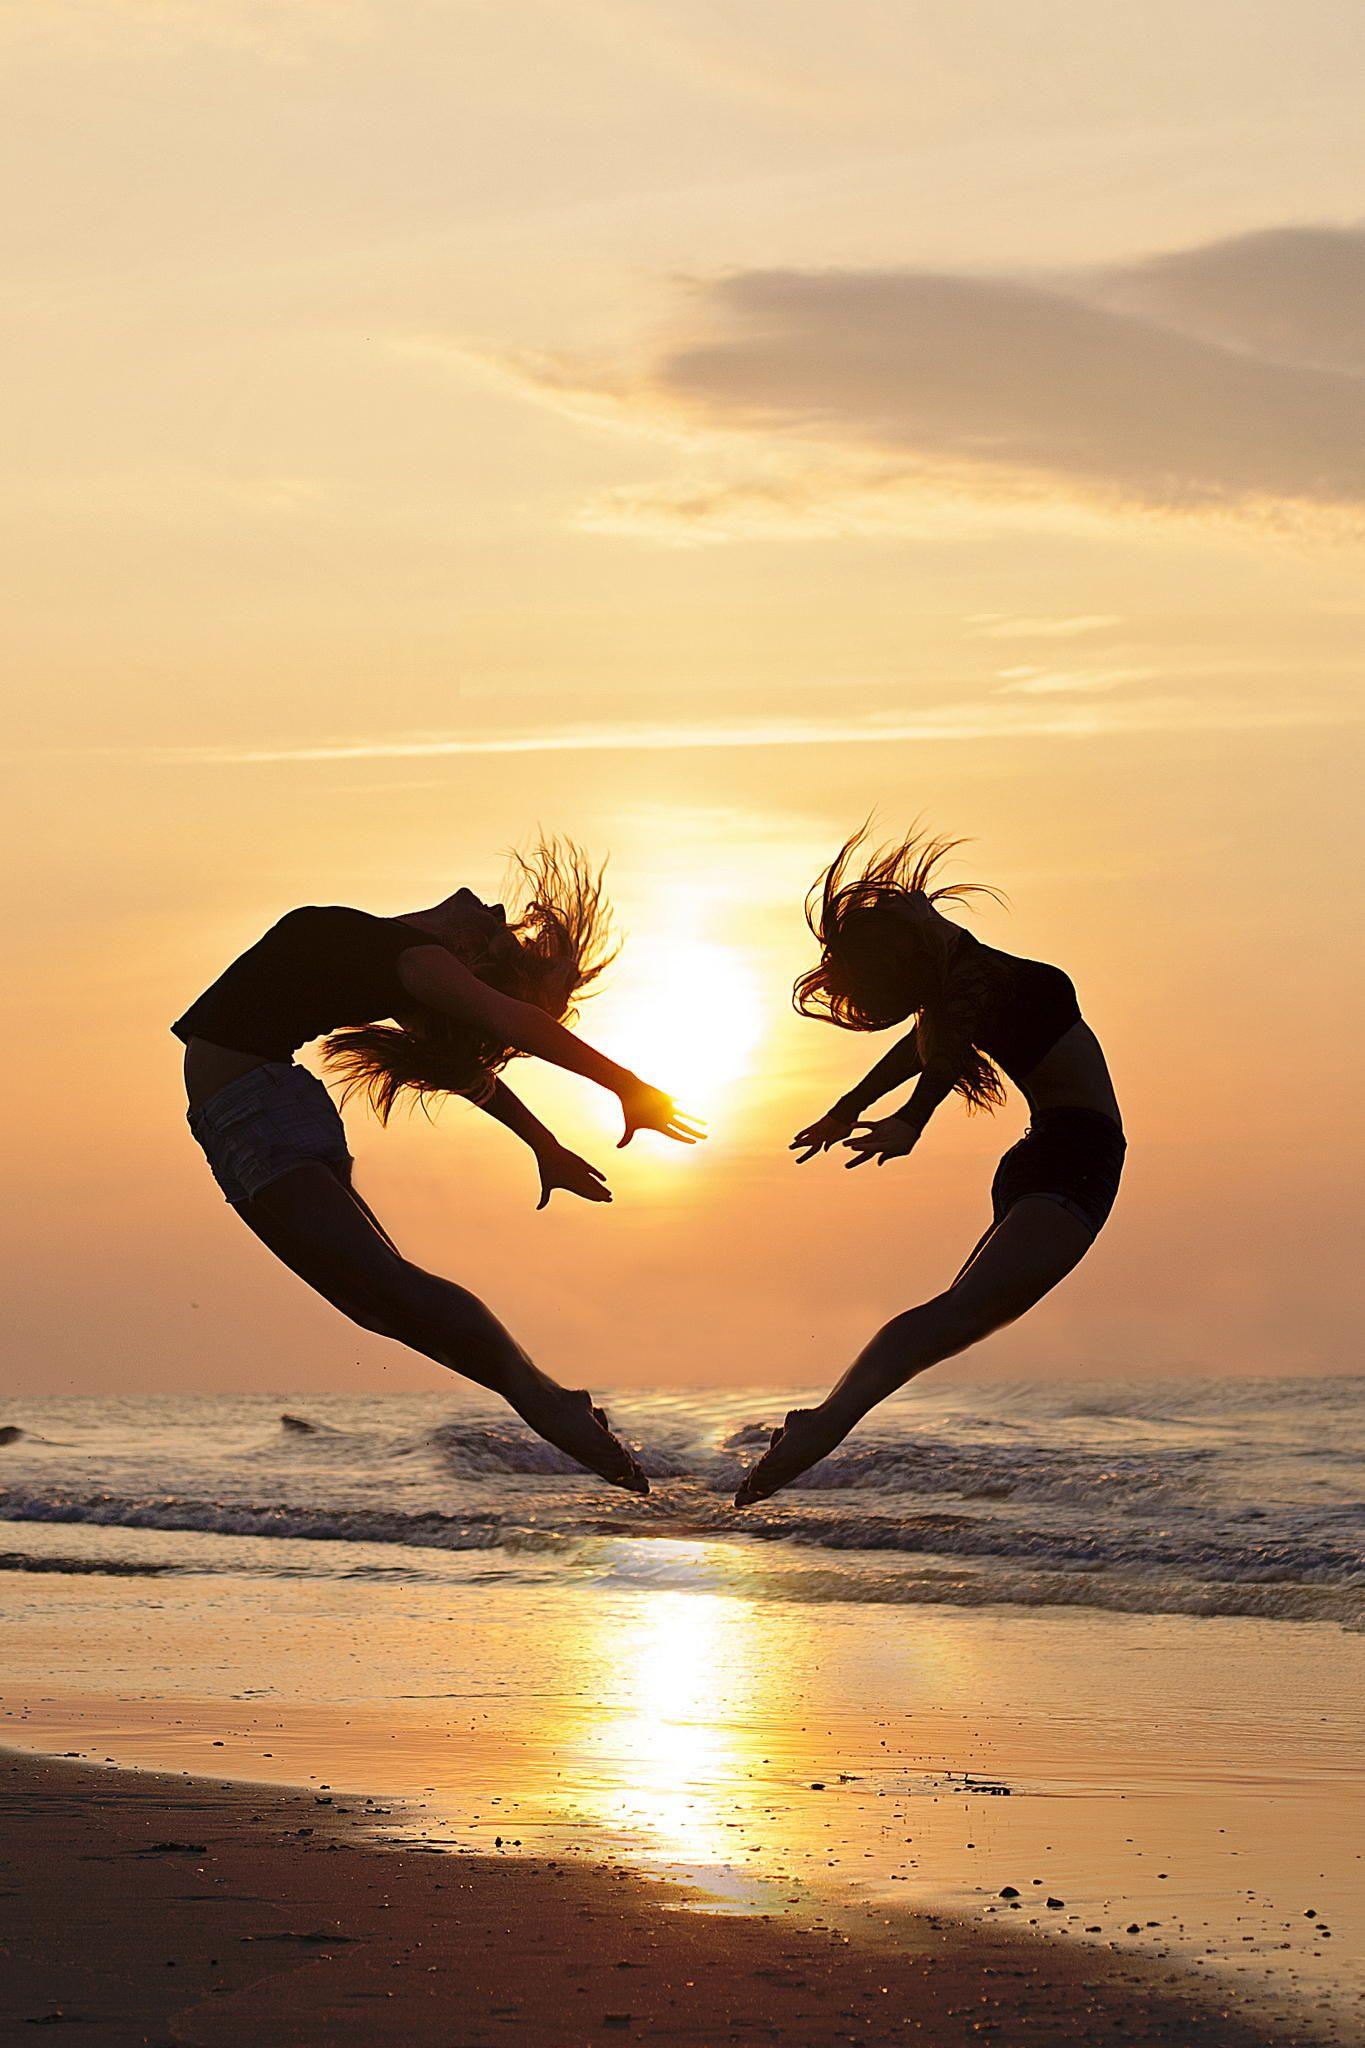 balletmoscow:  Прекрасная / Beautiful @marachok - In